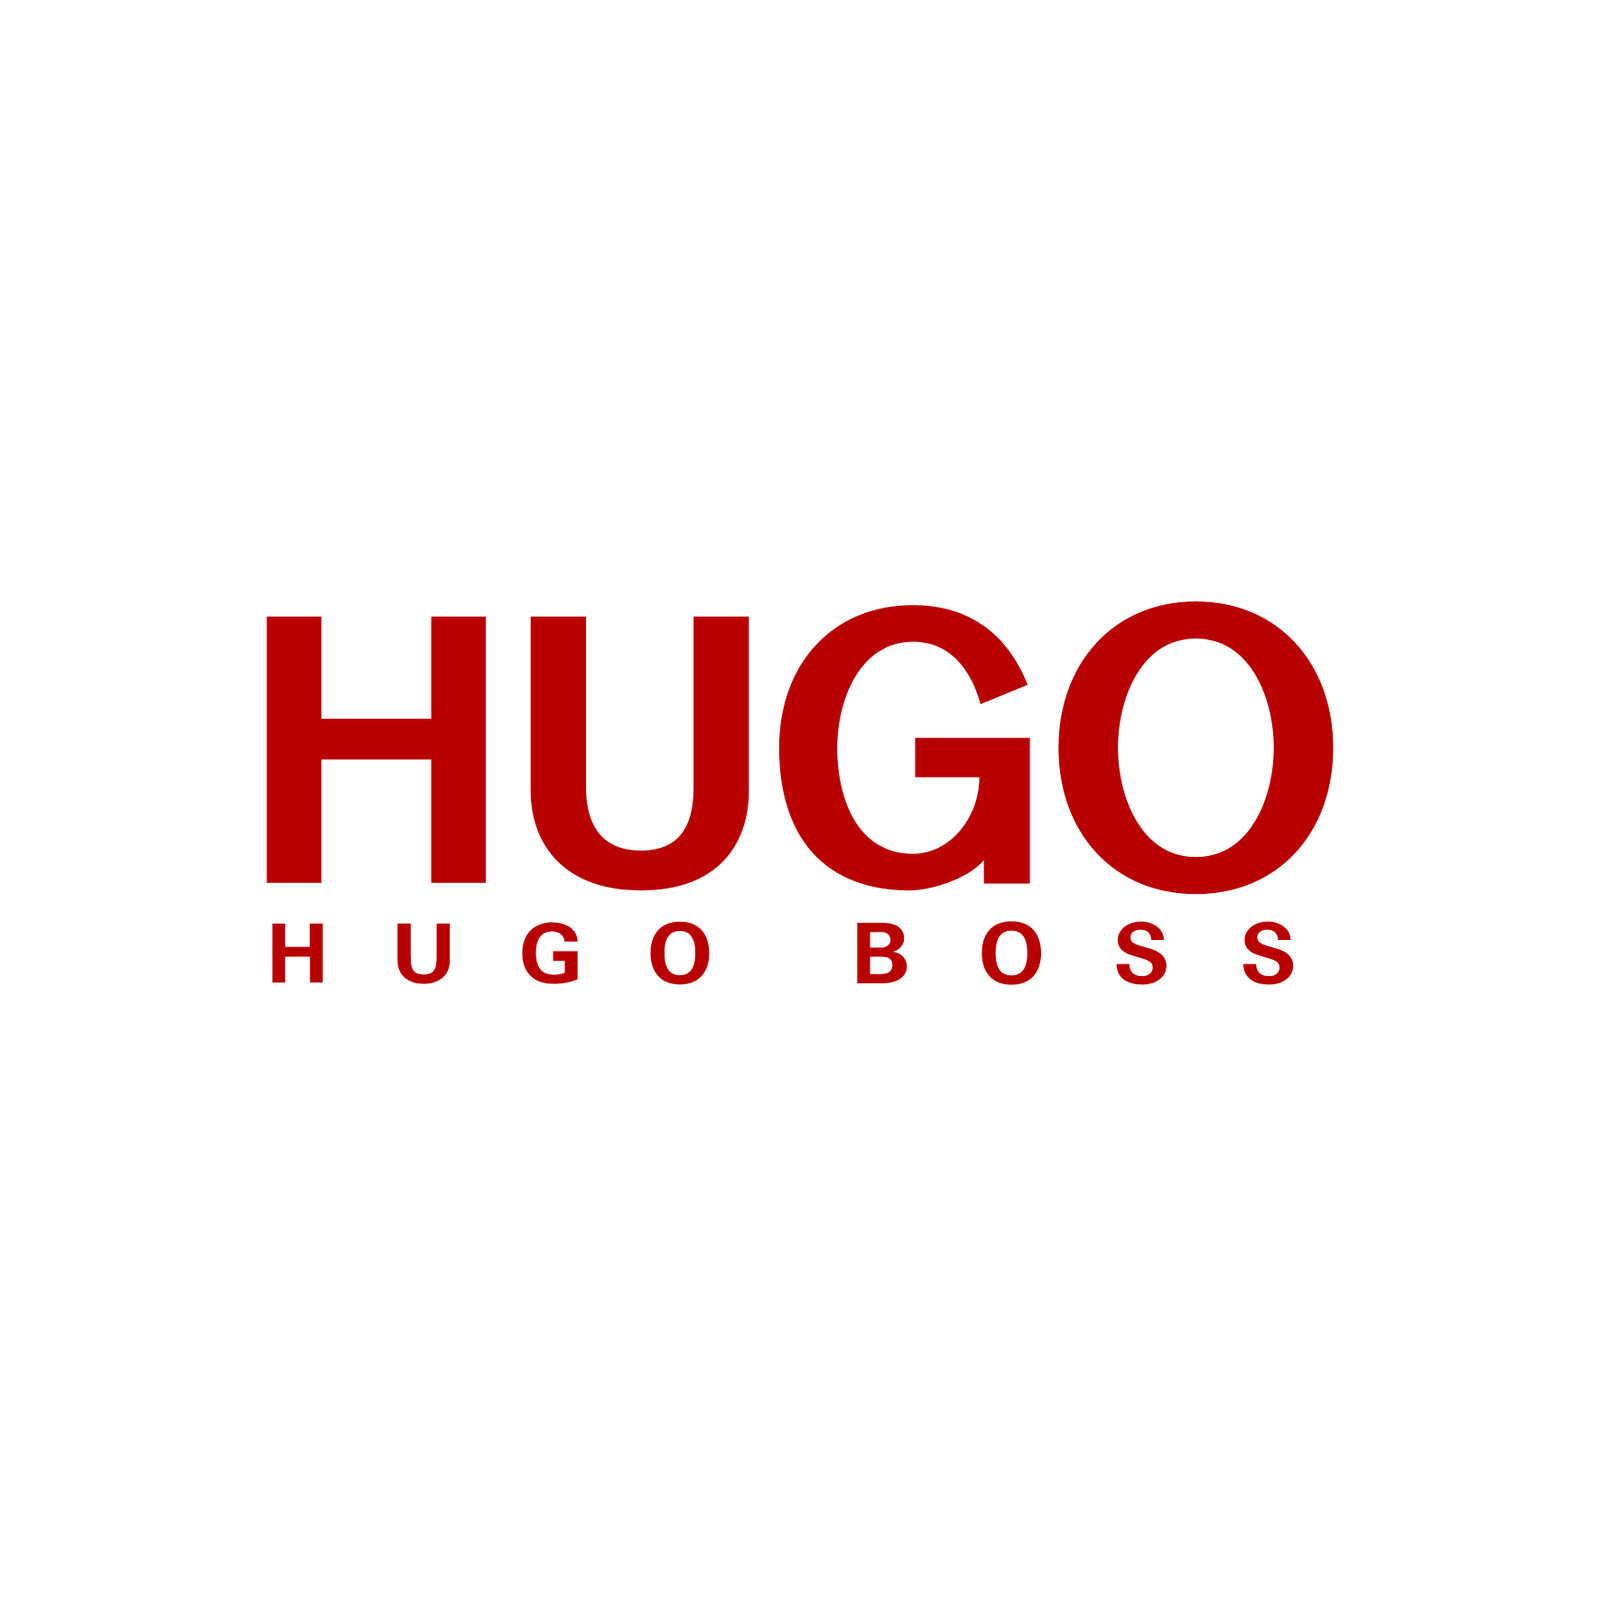 HUGO (Image 1)